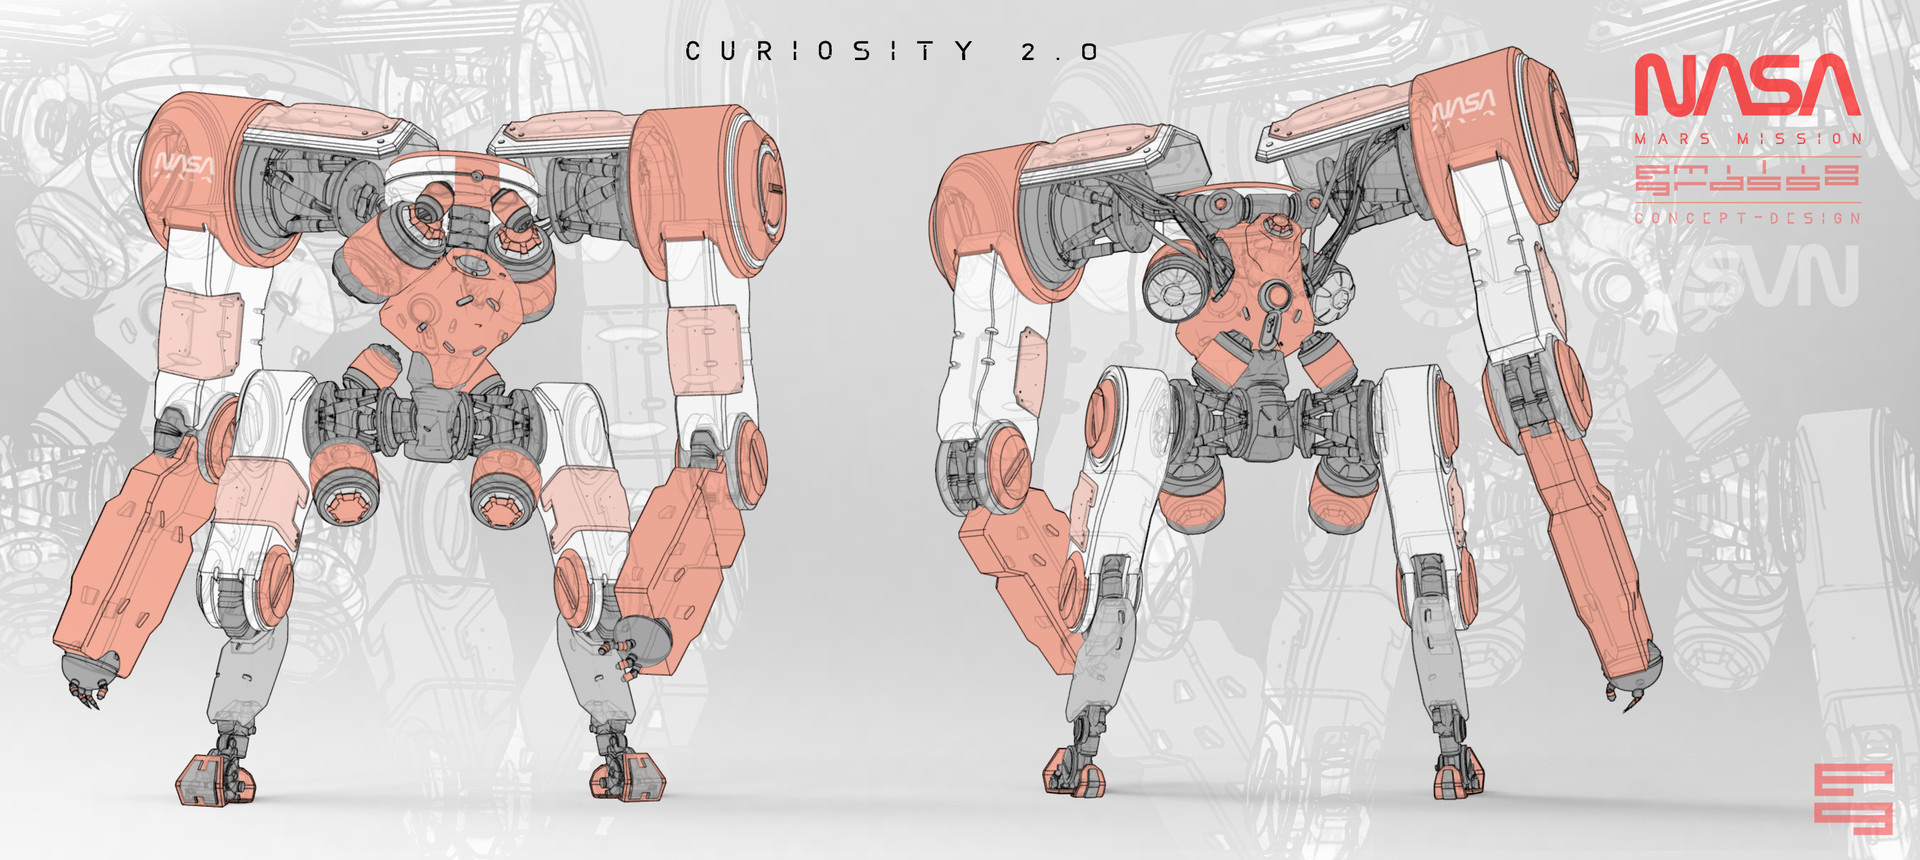 Curiosity 2.0